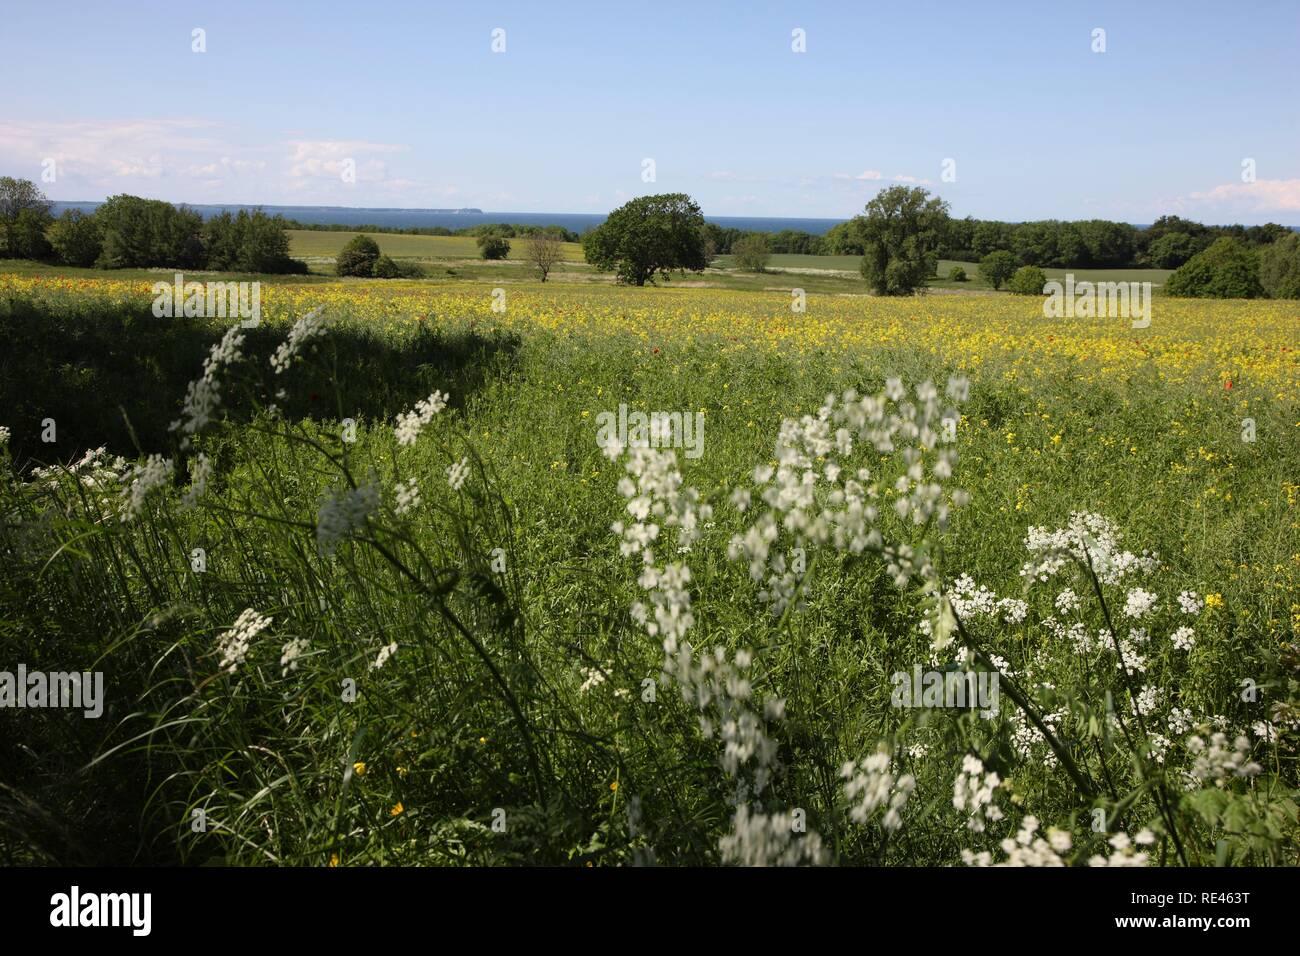 Meadows on the Baltic coast on the Jasmund peninsula, northeast of the Ruegen island, Mecklenburg-Western Pomerania - Stock Image